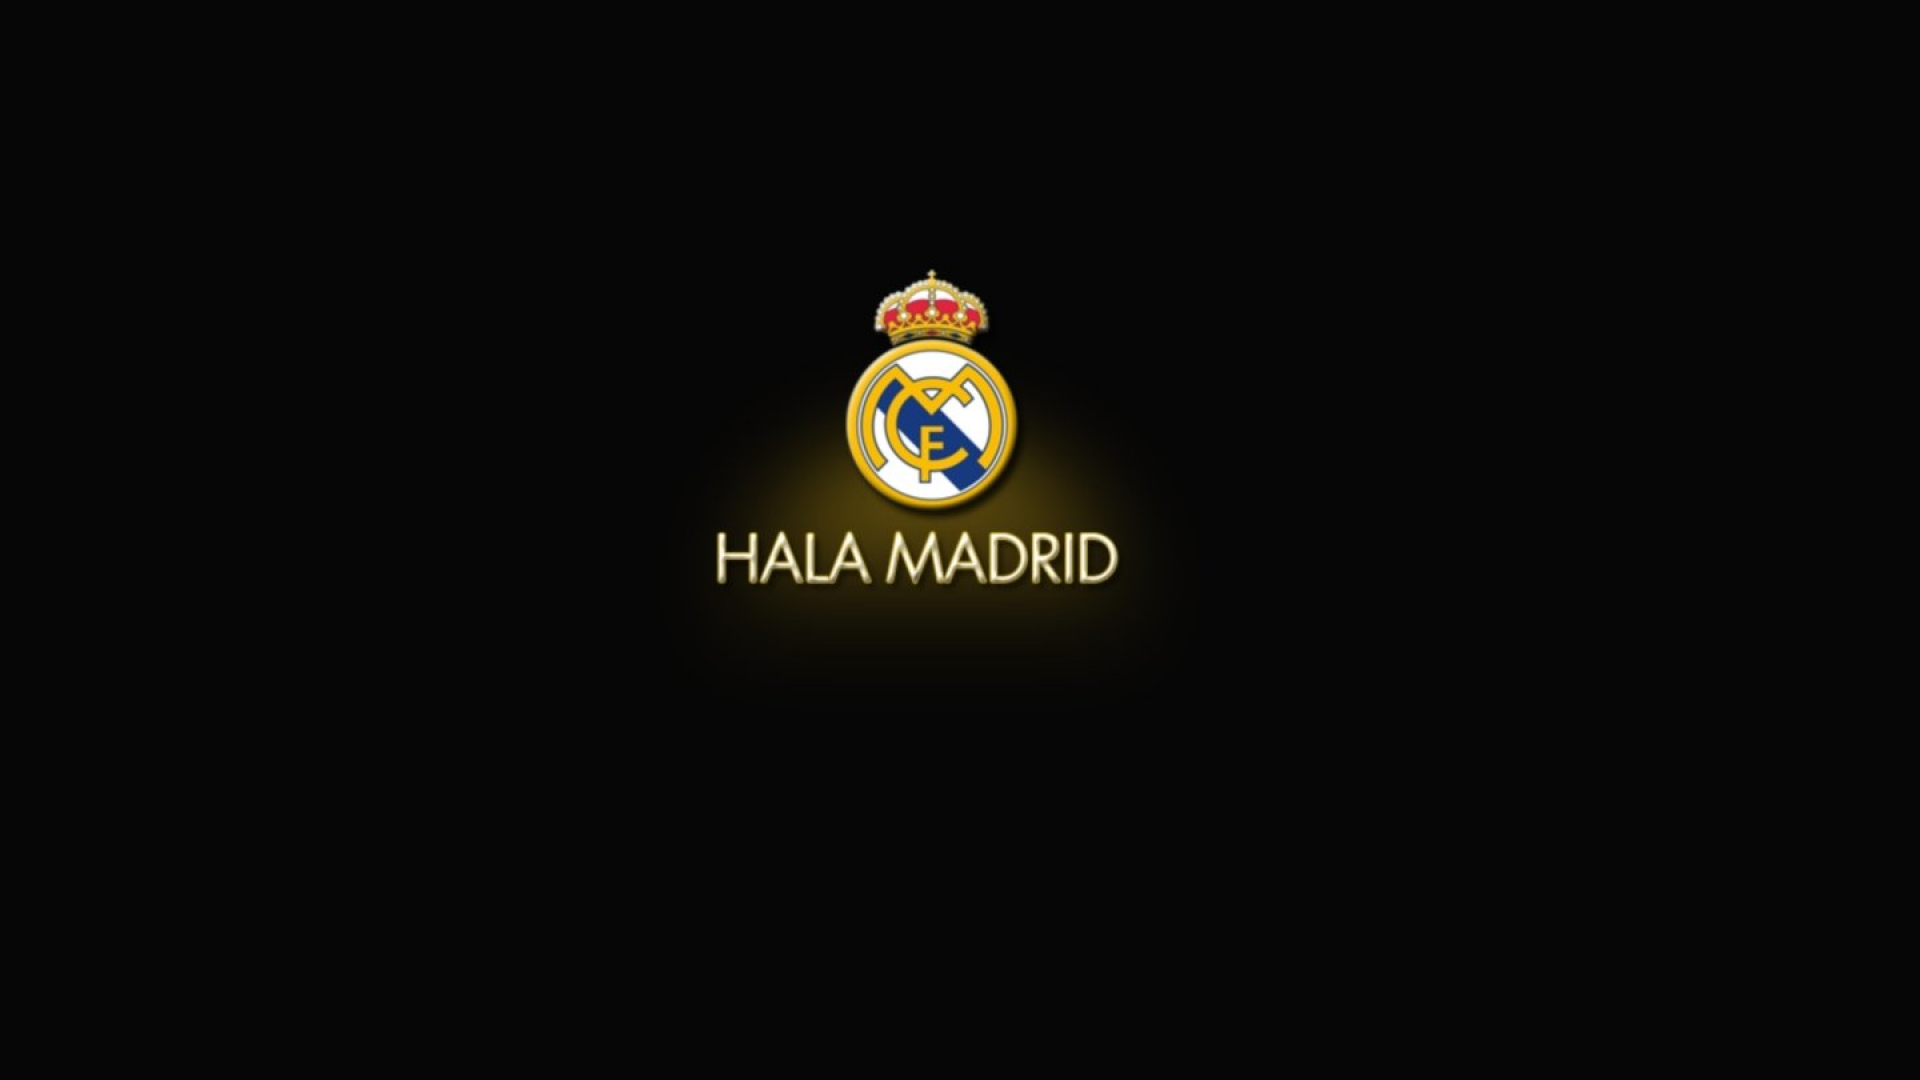 Real Madrid: Wallpaper Real Madrid HD